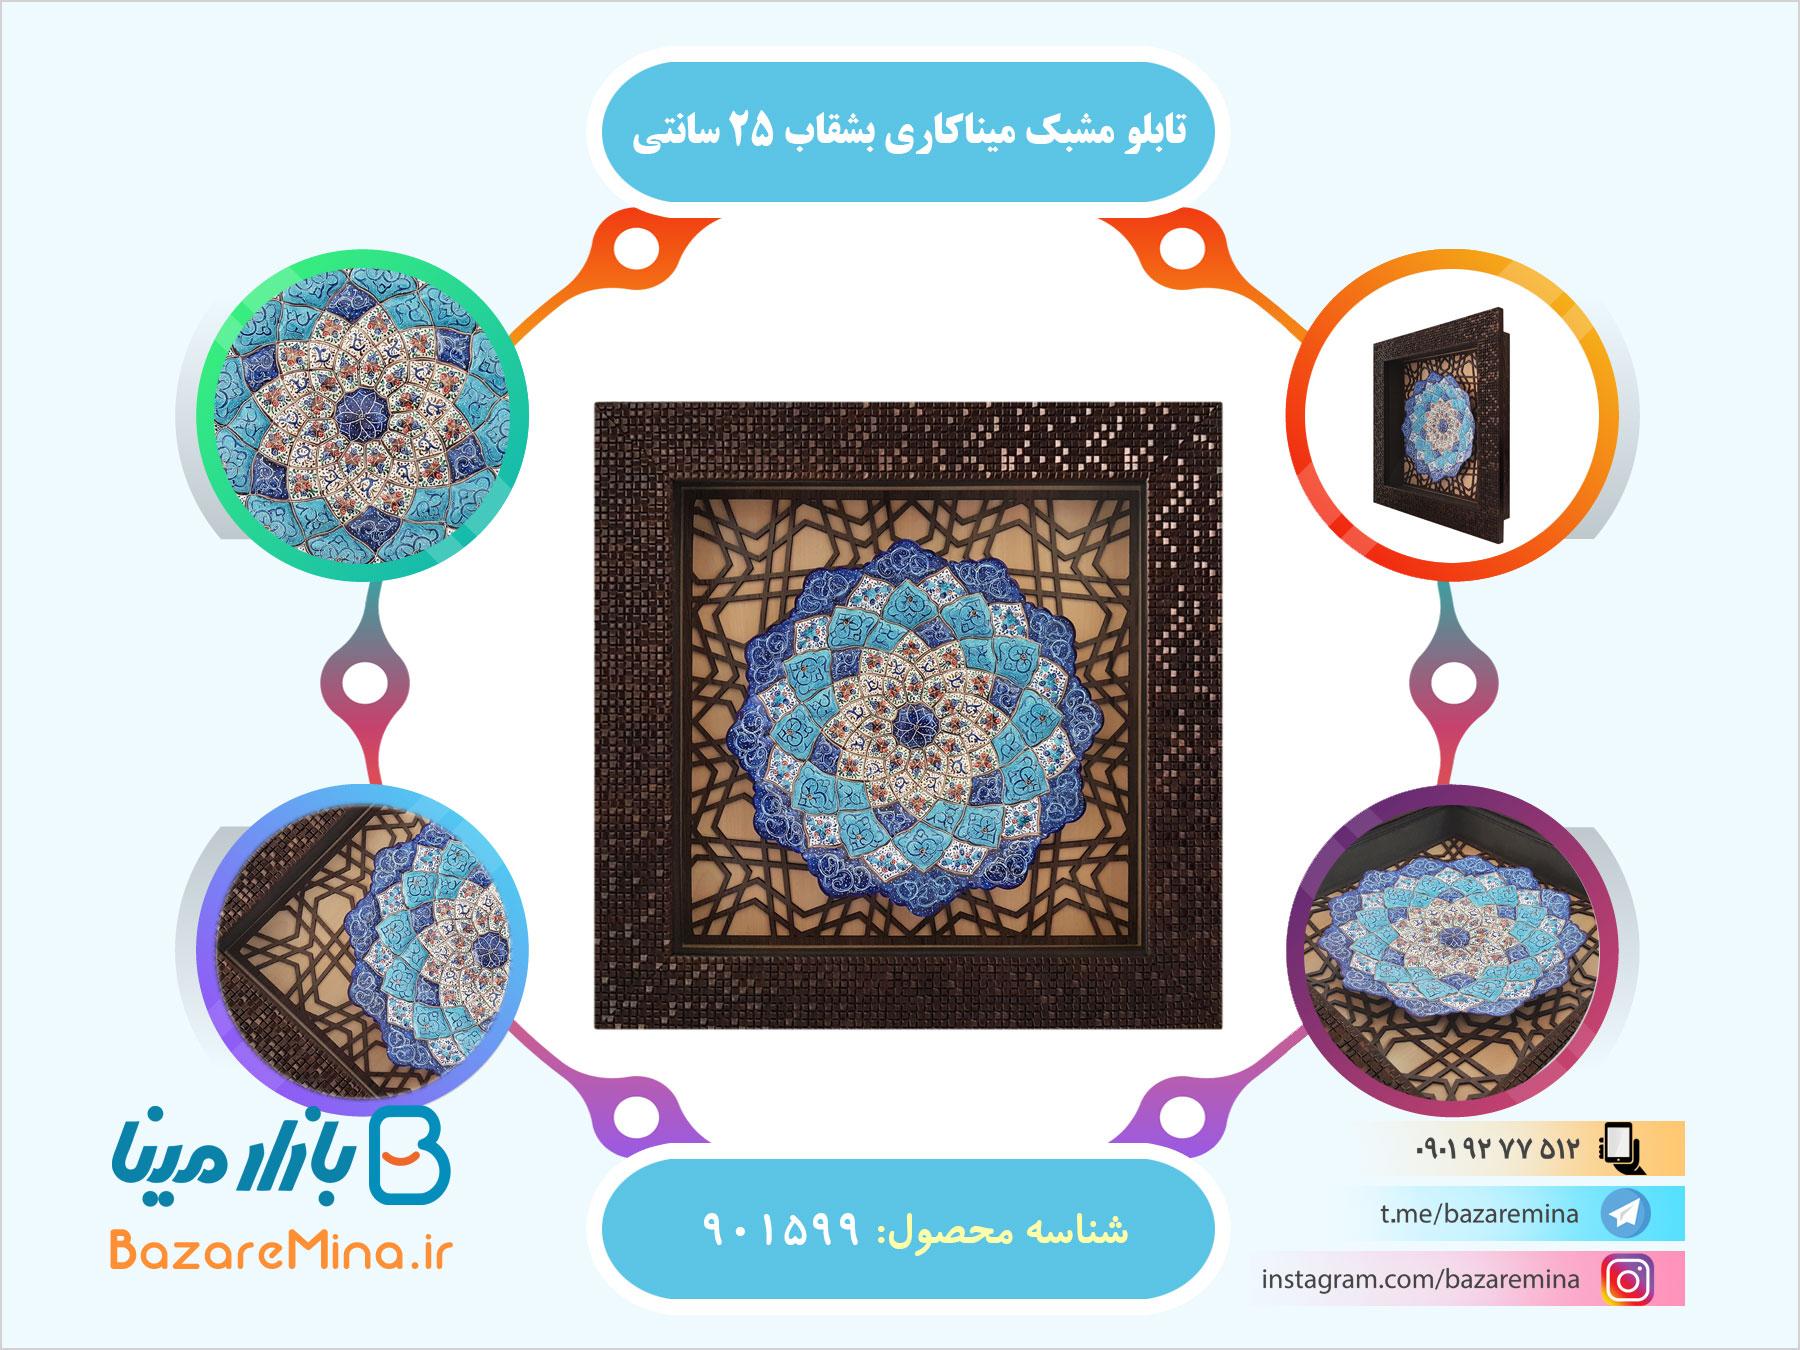 تابلو مشبک میناکاری اصفهان